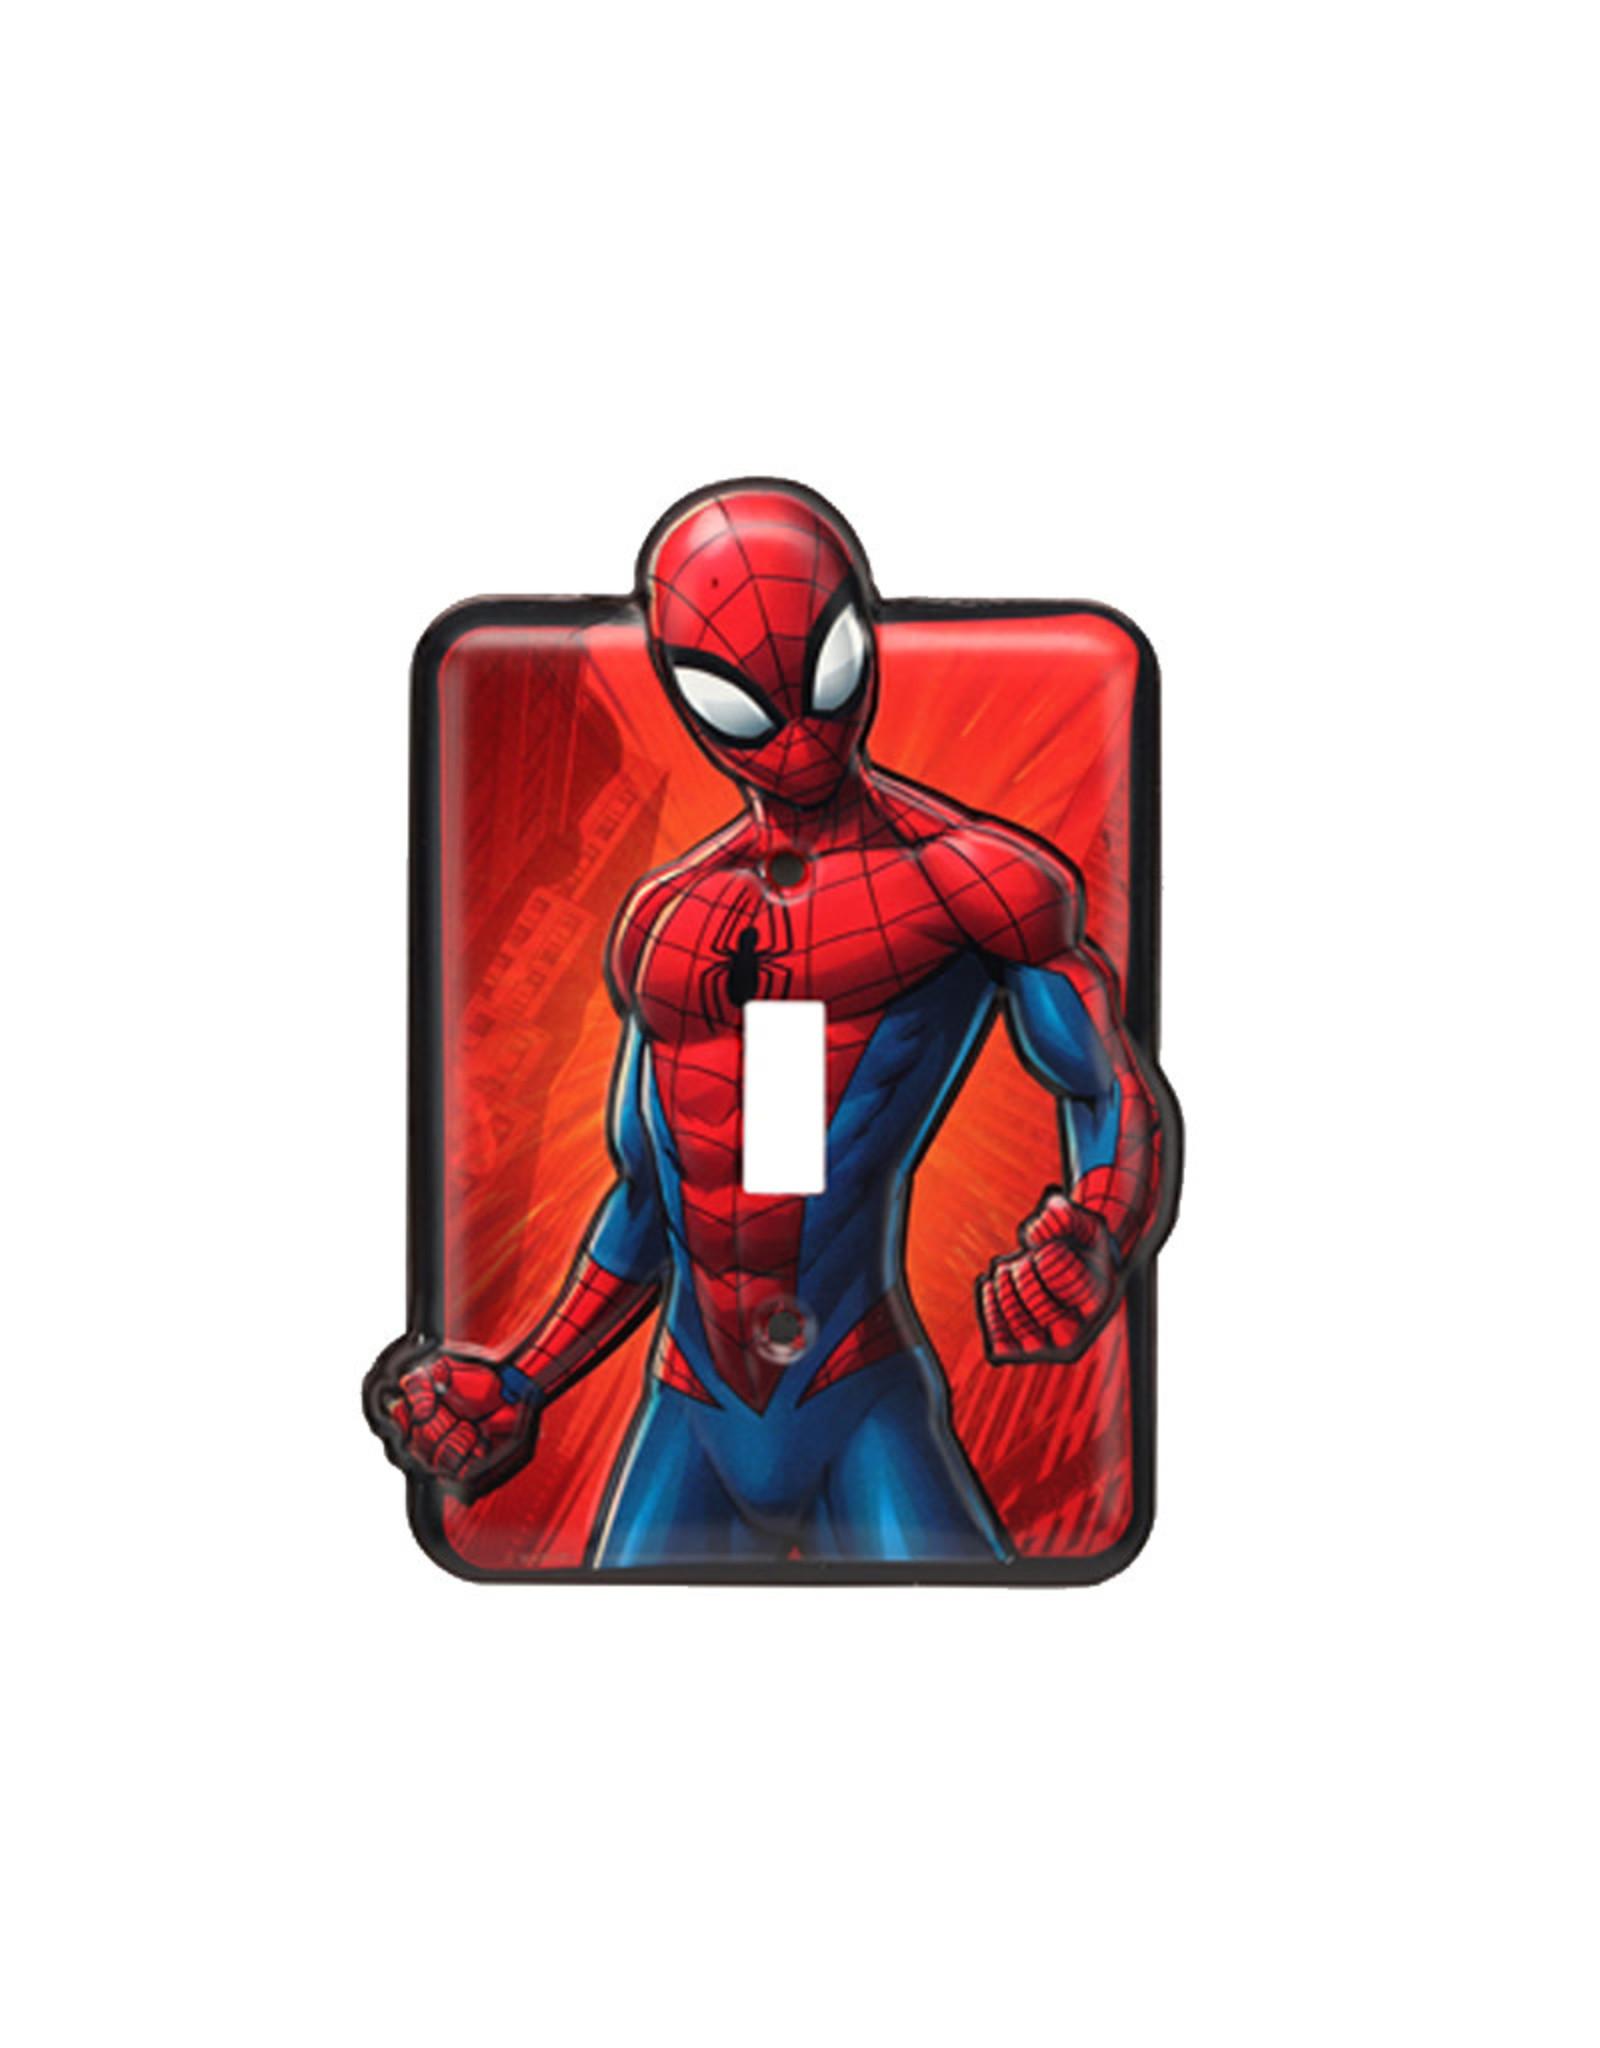 Marvel Marvel ( Switch Plate ) Spider-Man